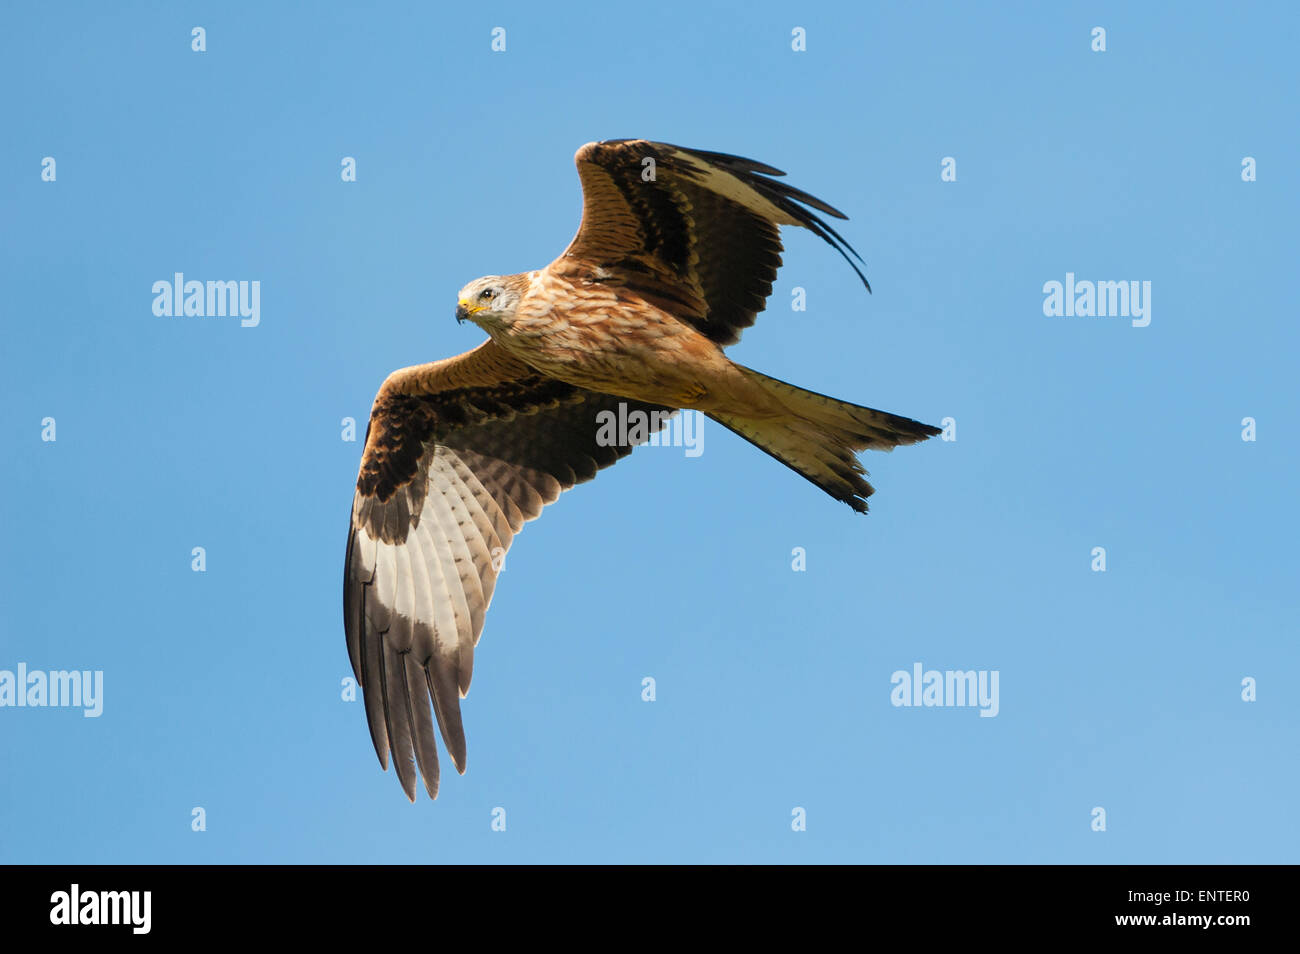 Red Kite (Milvus milvus) flying in Dumfries and Galloway, Scotland, UK - Stock Image